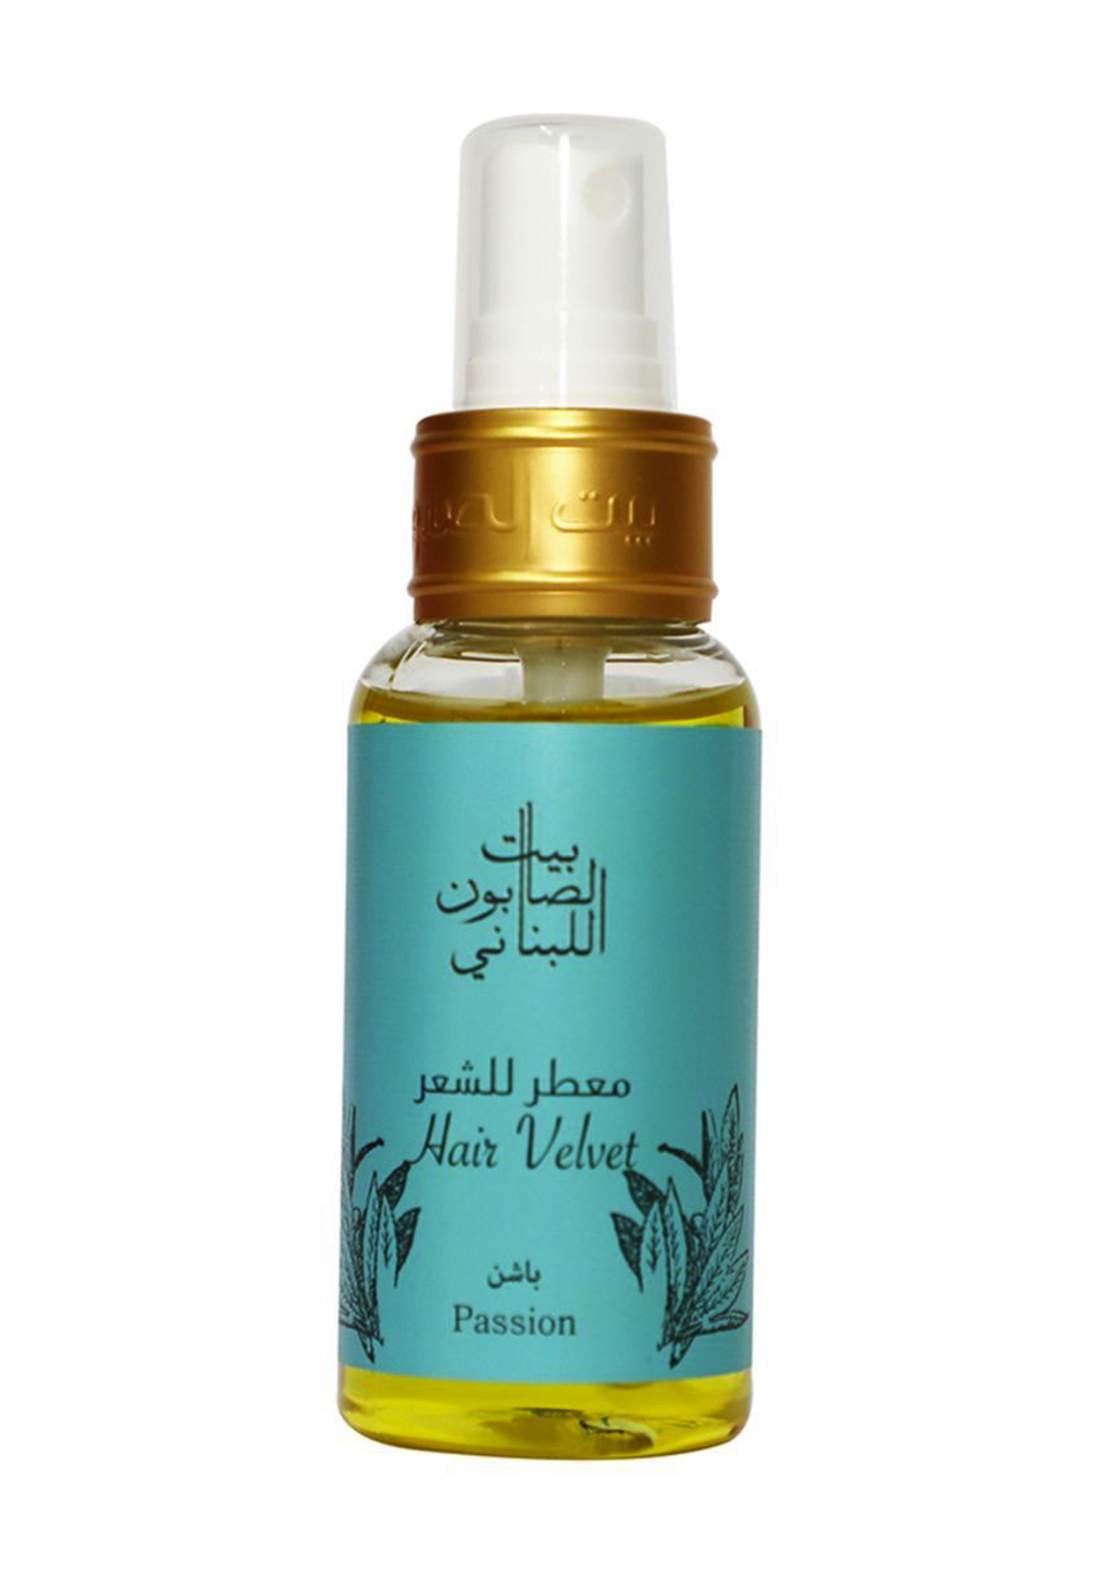 Bayt Alsaboun Alloubnani-317444 Hair Velvet Passion 80 Ml معطر للشعر